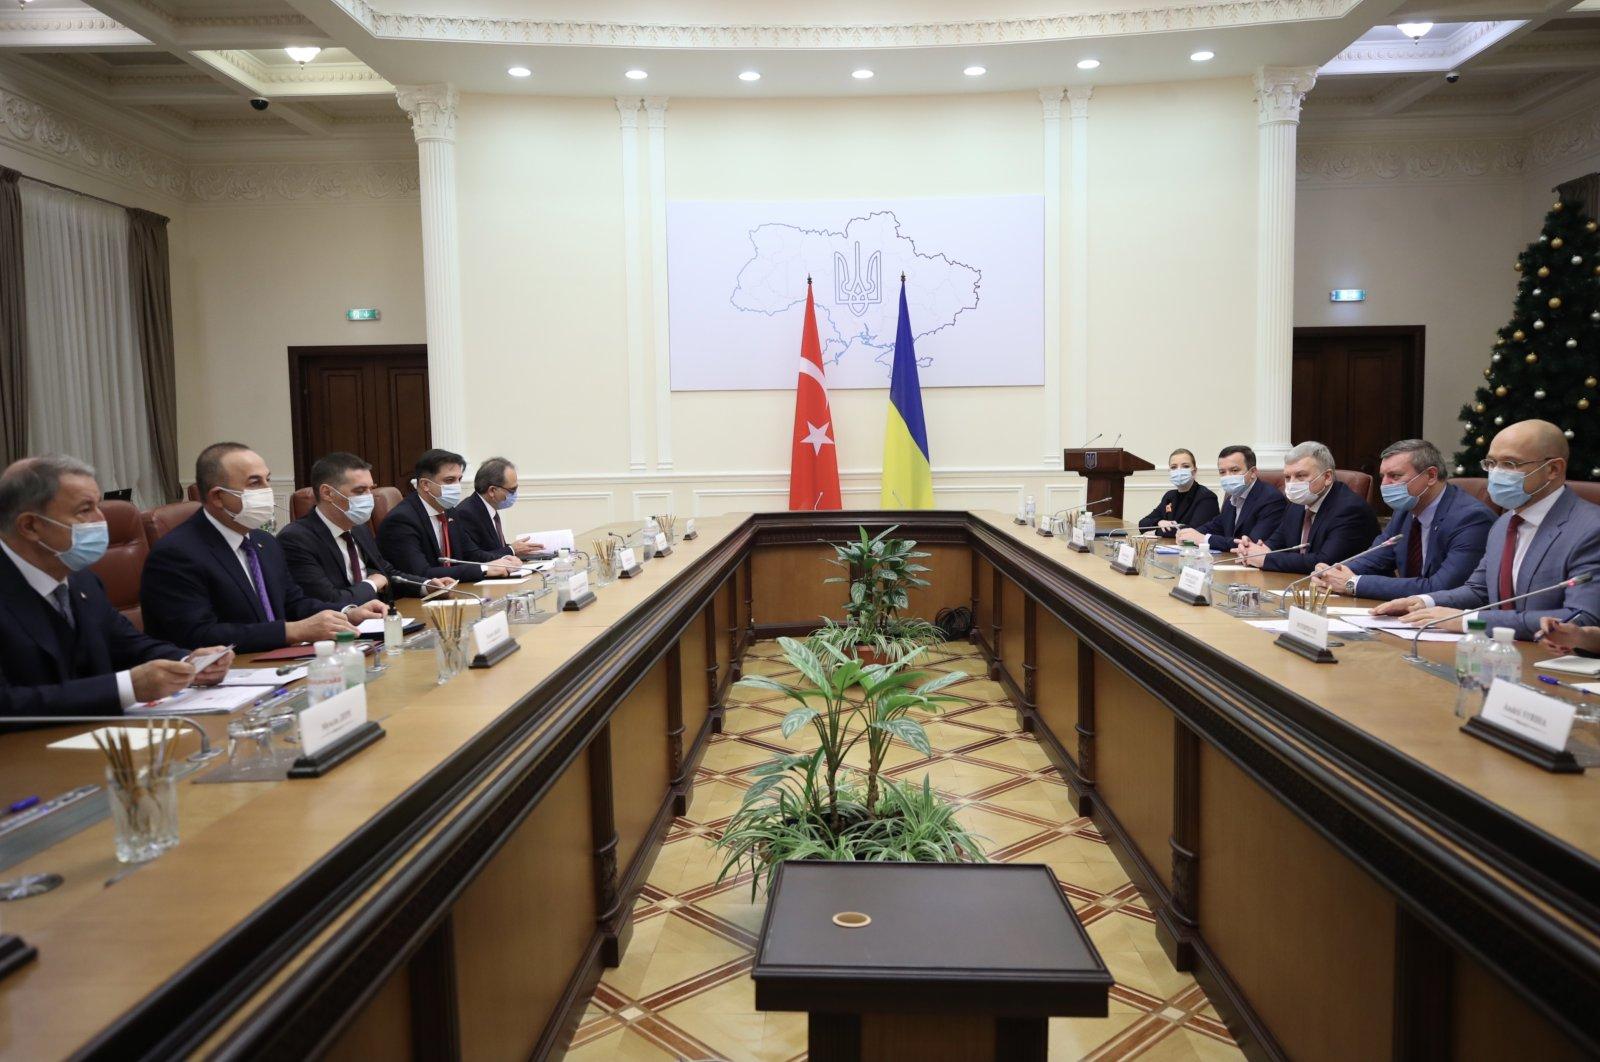 Defense Minister Hulusi Akar (1st L) and Foreign Minister Mevlüt Çavuşoğlu (2nd L) meet with Ukrainian Prime Minister Denys Shmyhal (2nd R) in Kyiv, Ukraine, Dec. 18, 2020. (AA Photo)